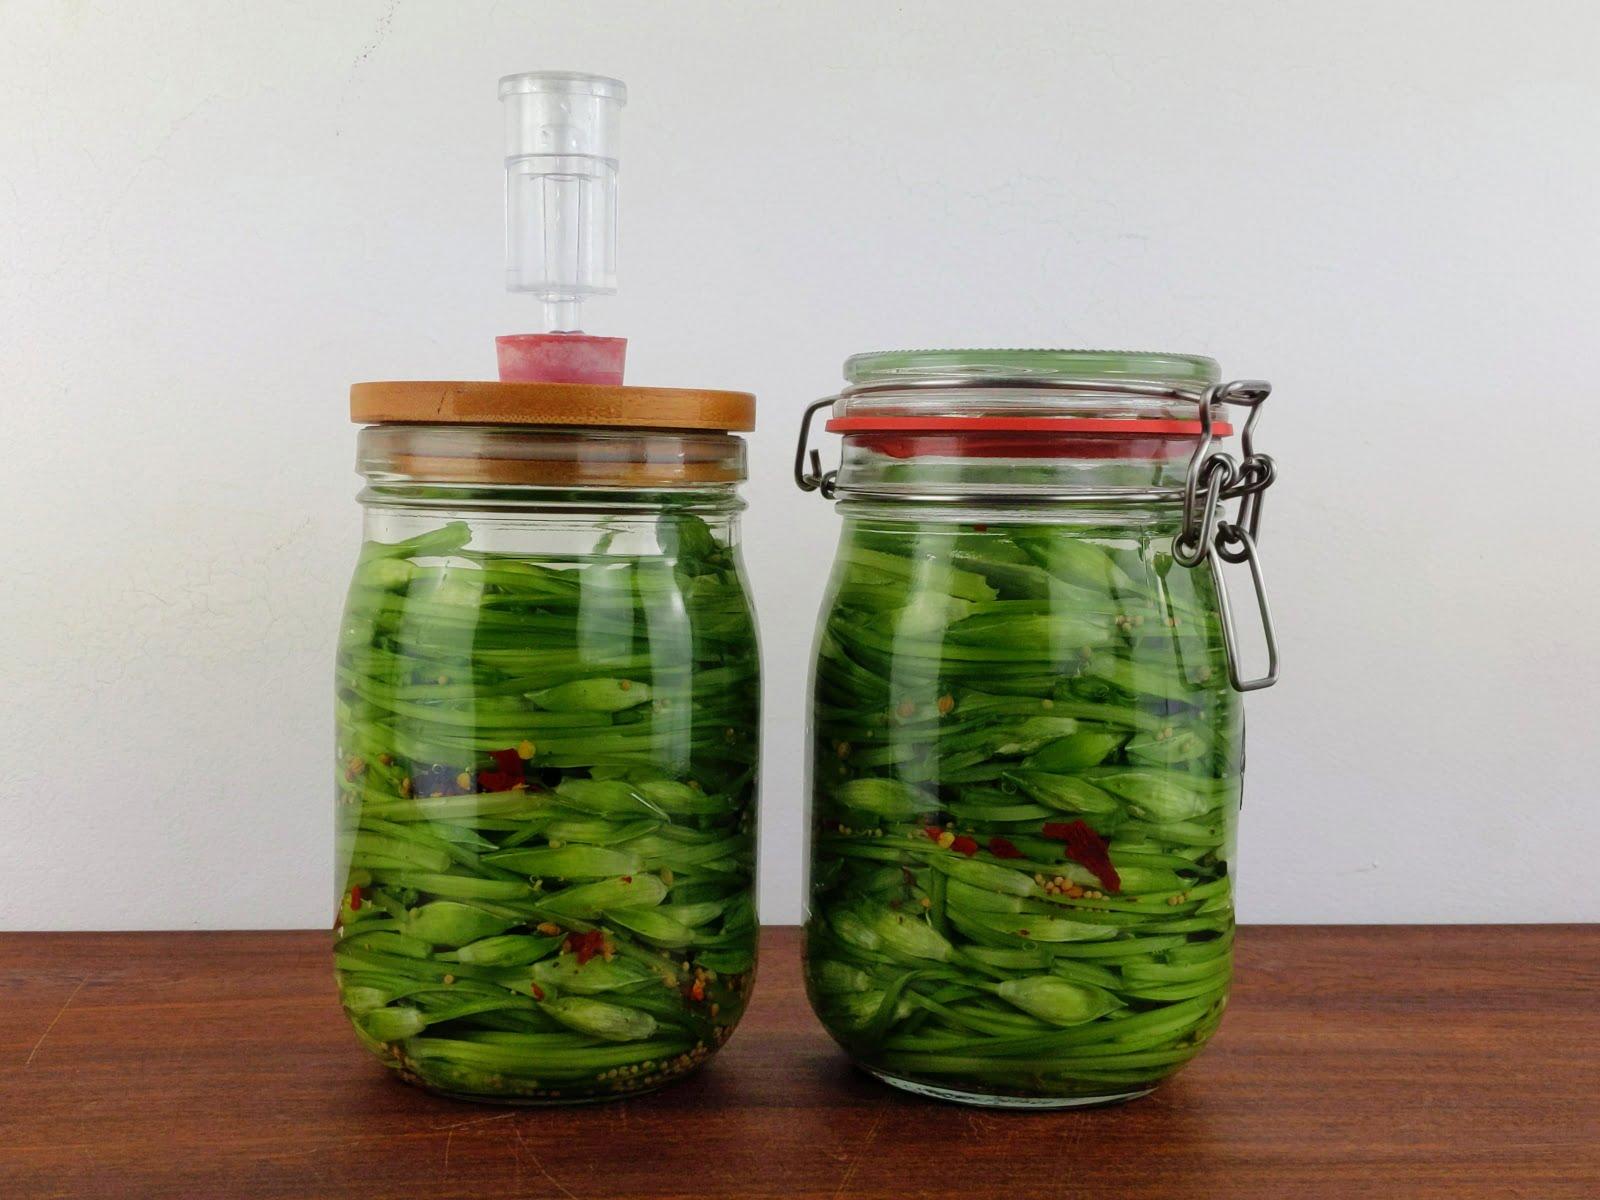 fermented wild garlic buds recipe in fermentation jars